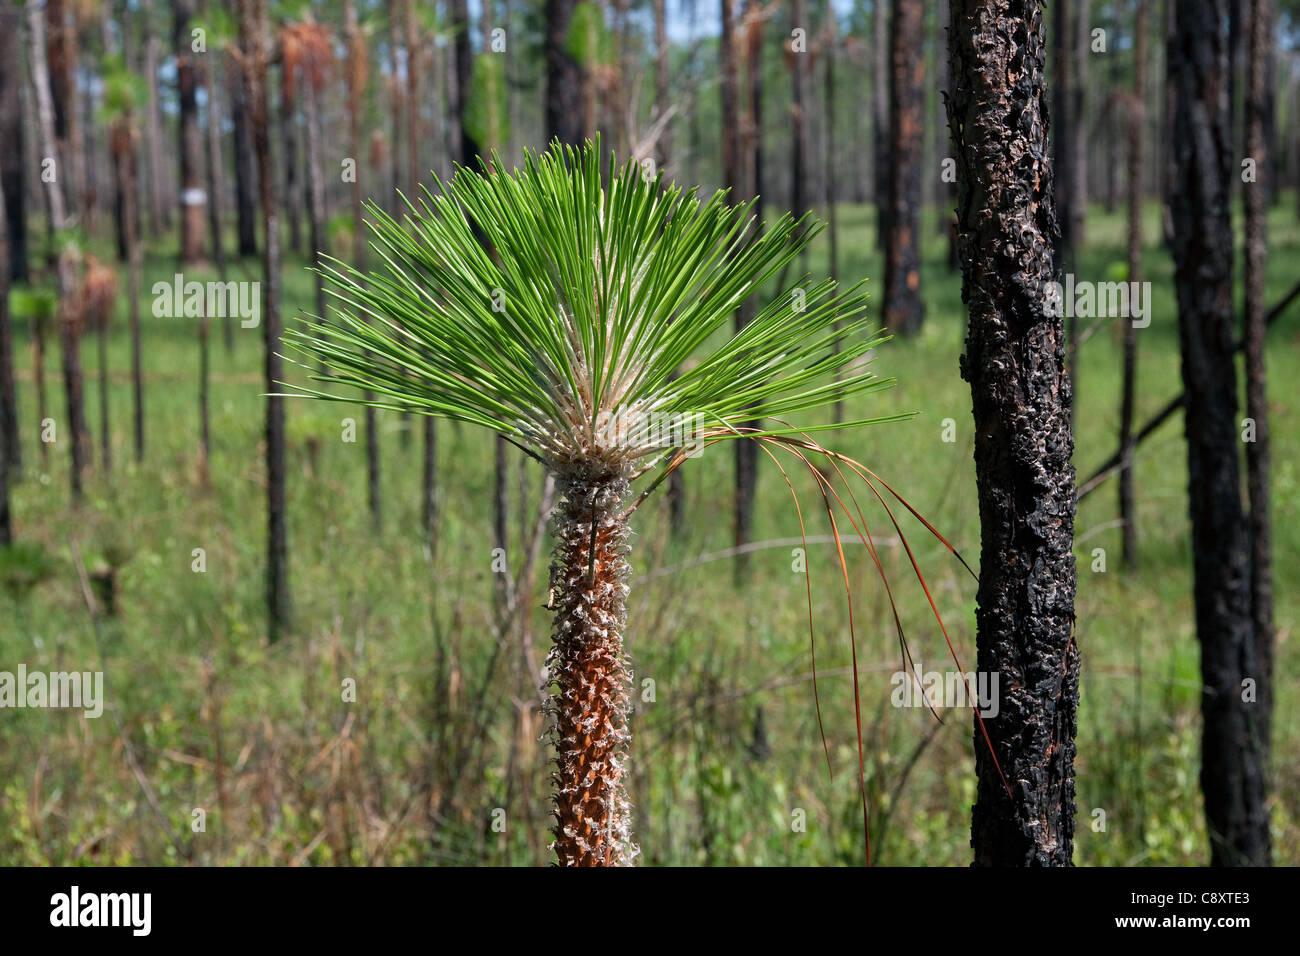 Tip of young Longleaf Pine Tree or sapling Pinus palustris Florida USA - Stock Image